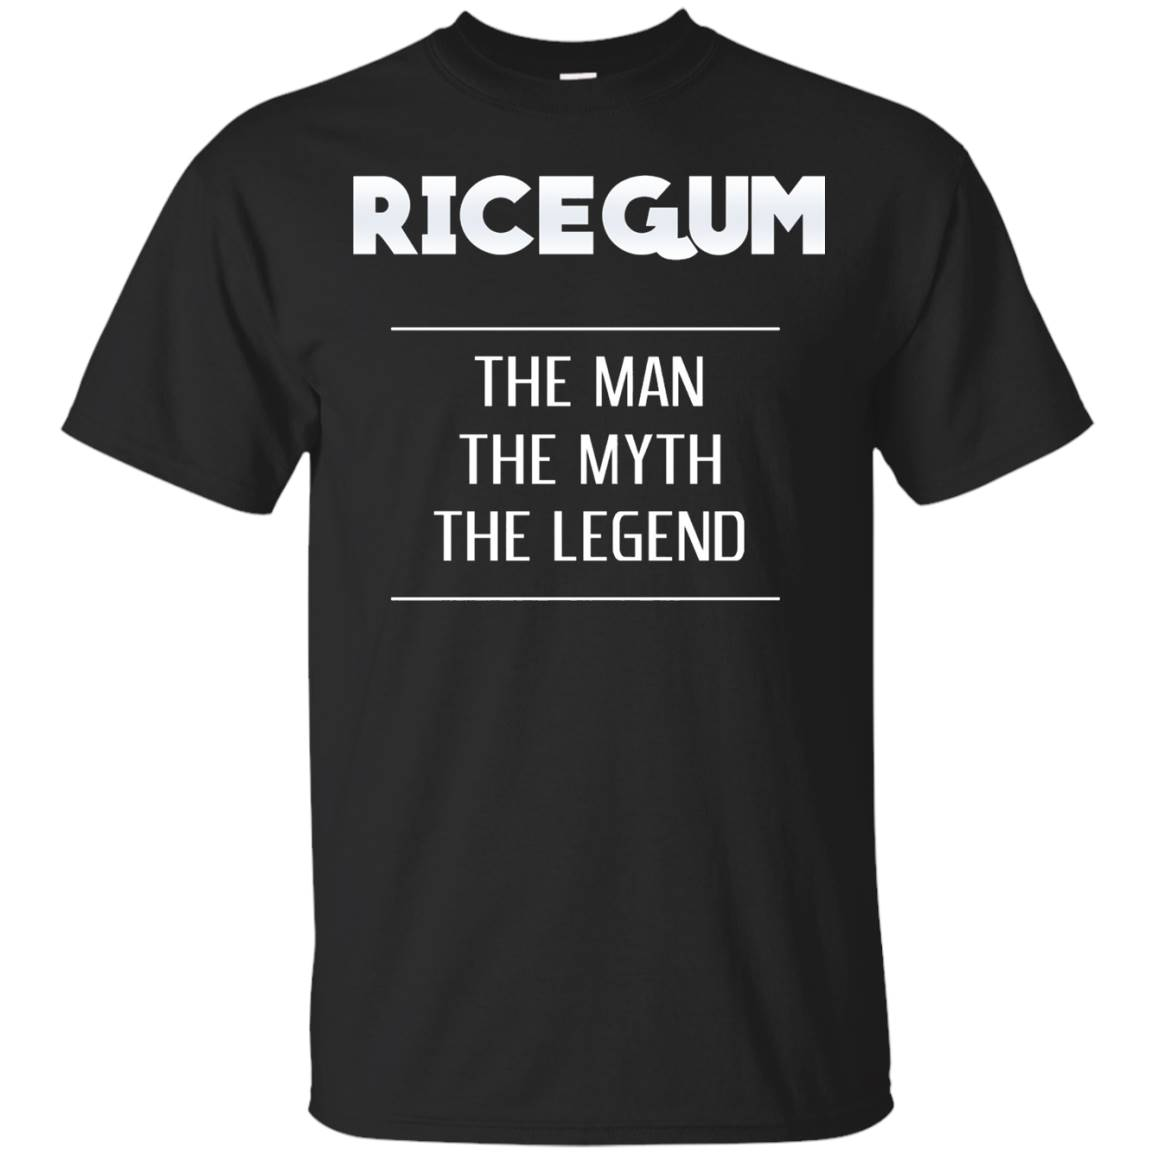 Ricegum, The Man, The Myth, The Legend – Funny – T Shirt